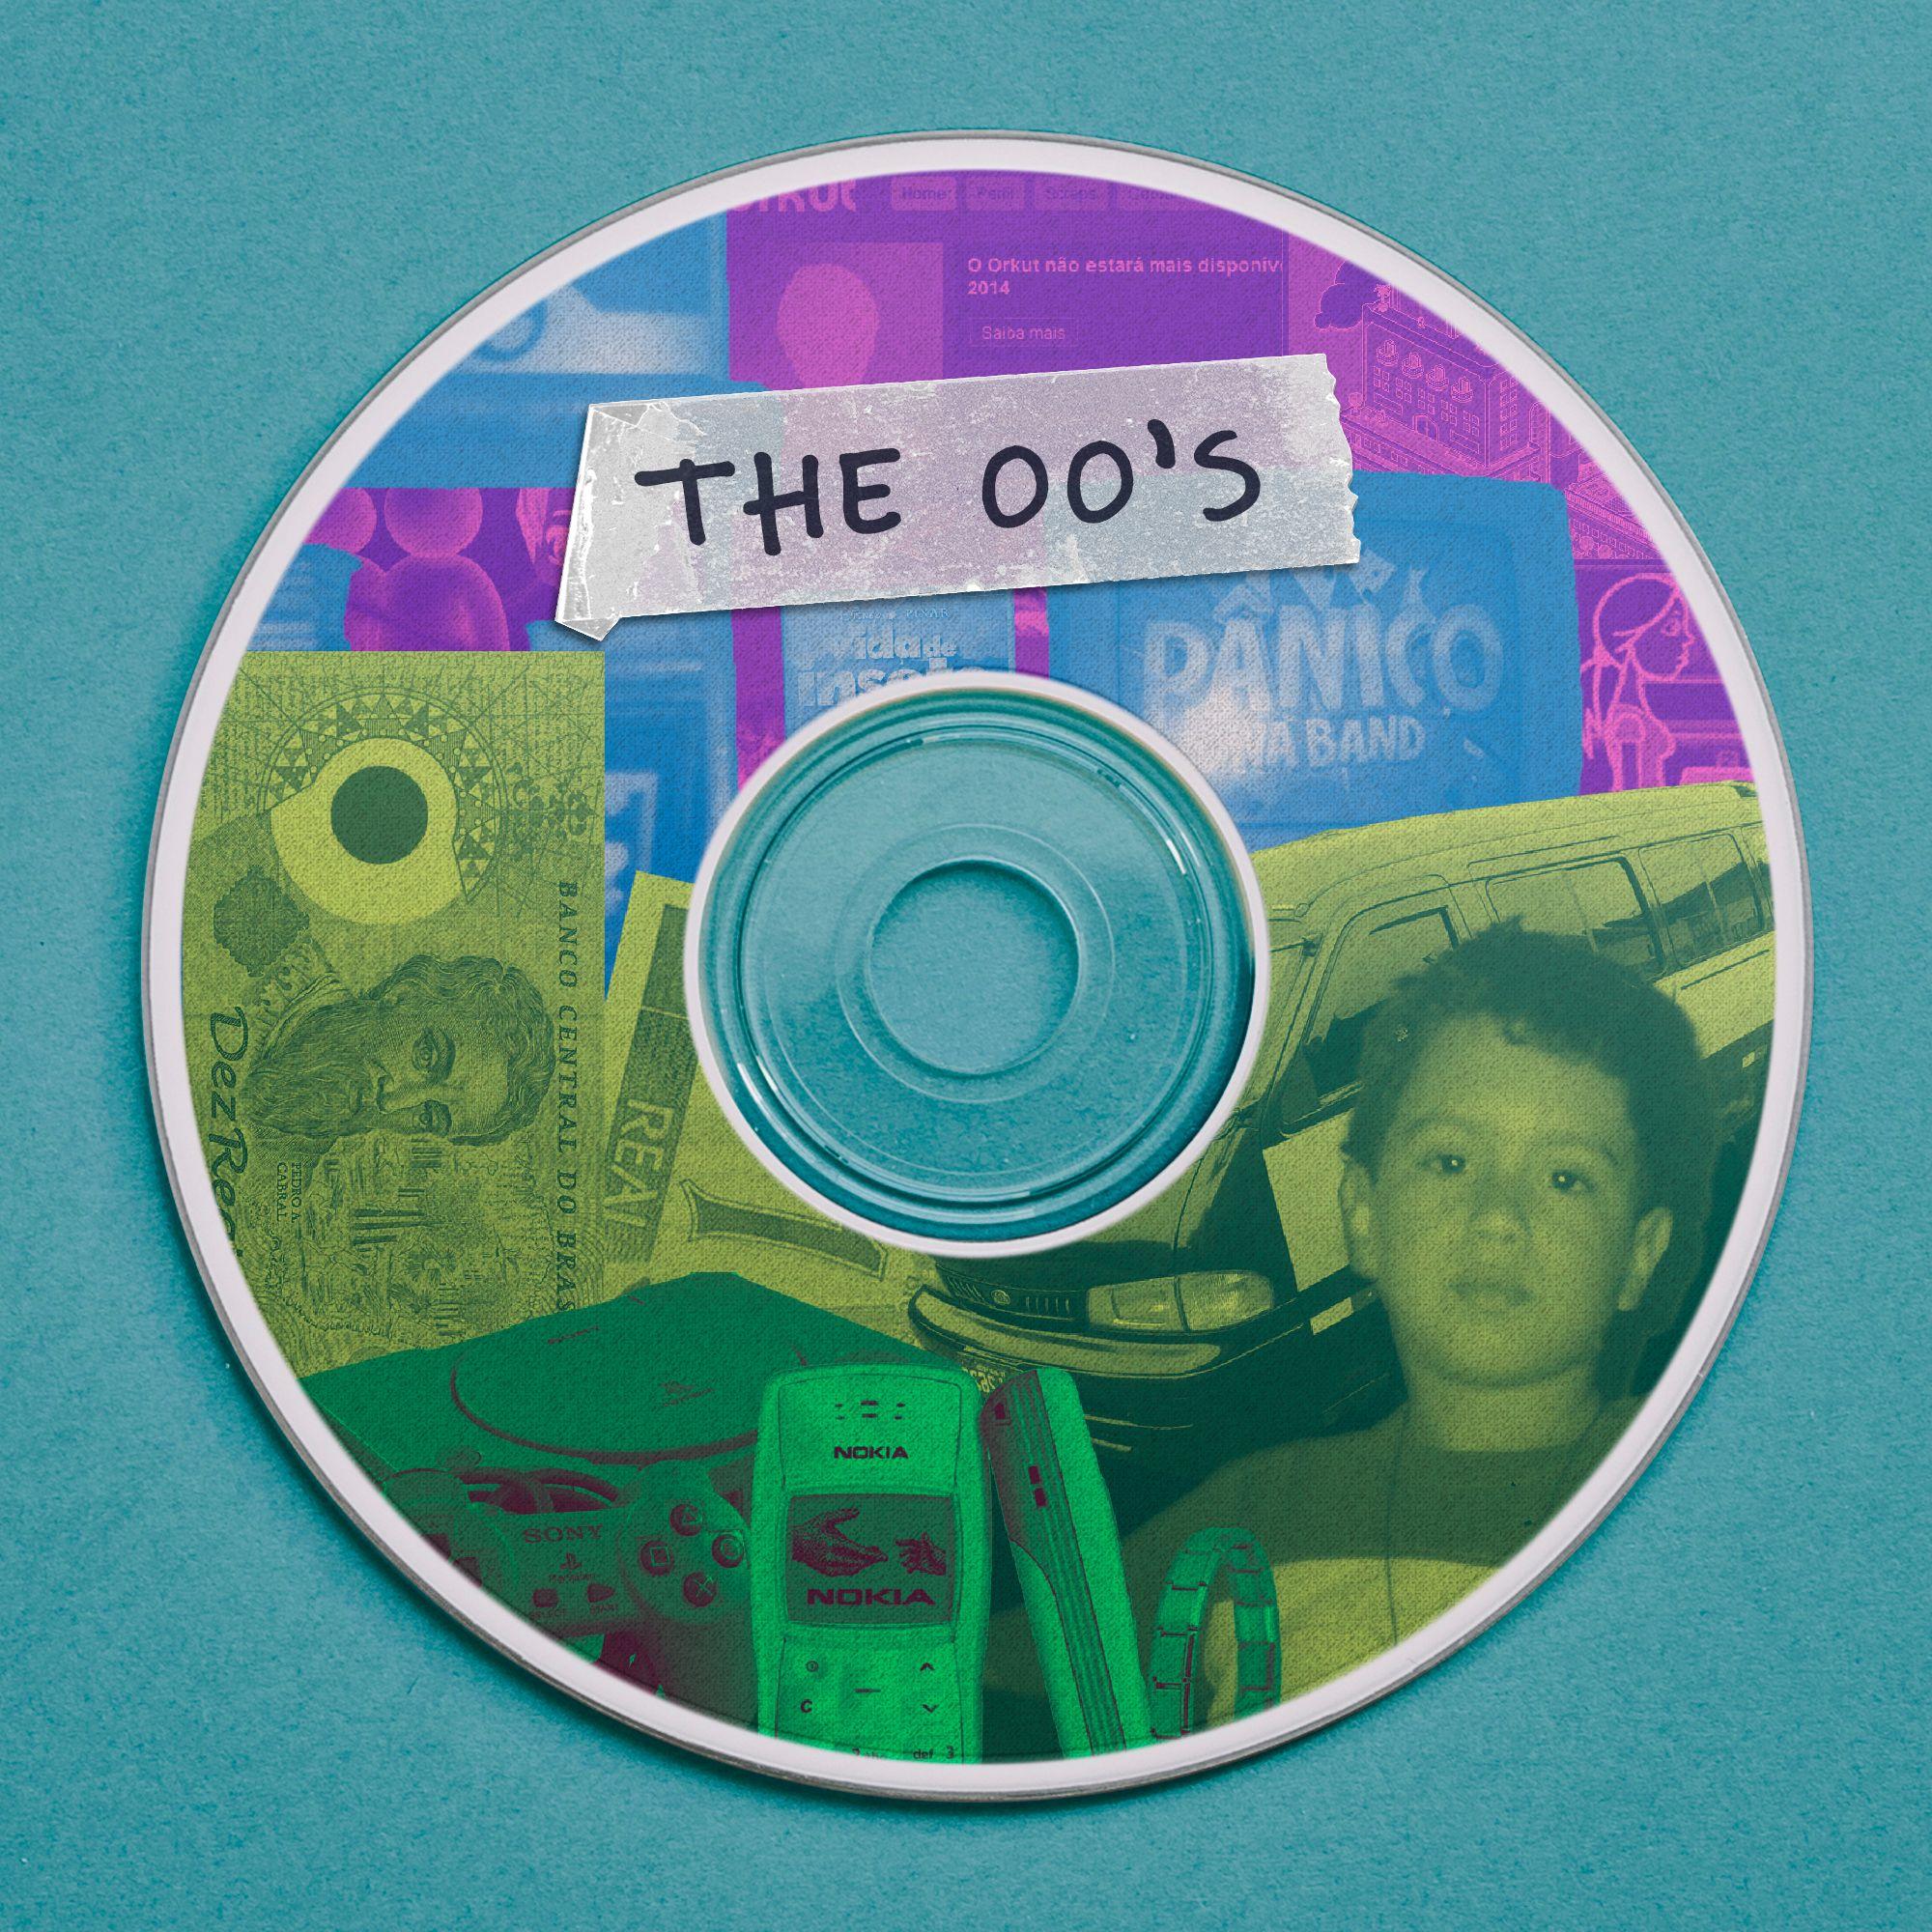 The 00's | Music cover photos, Music album cover, Playlist names ideas